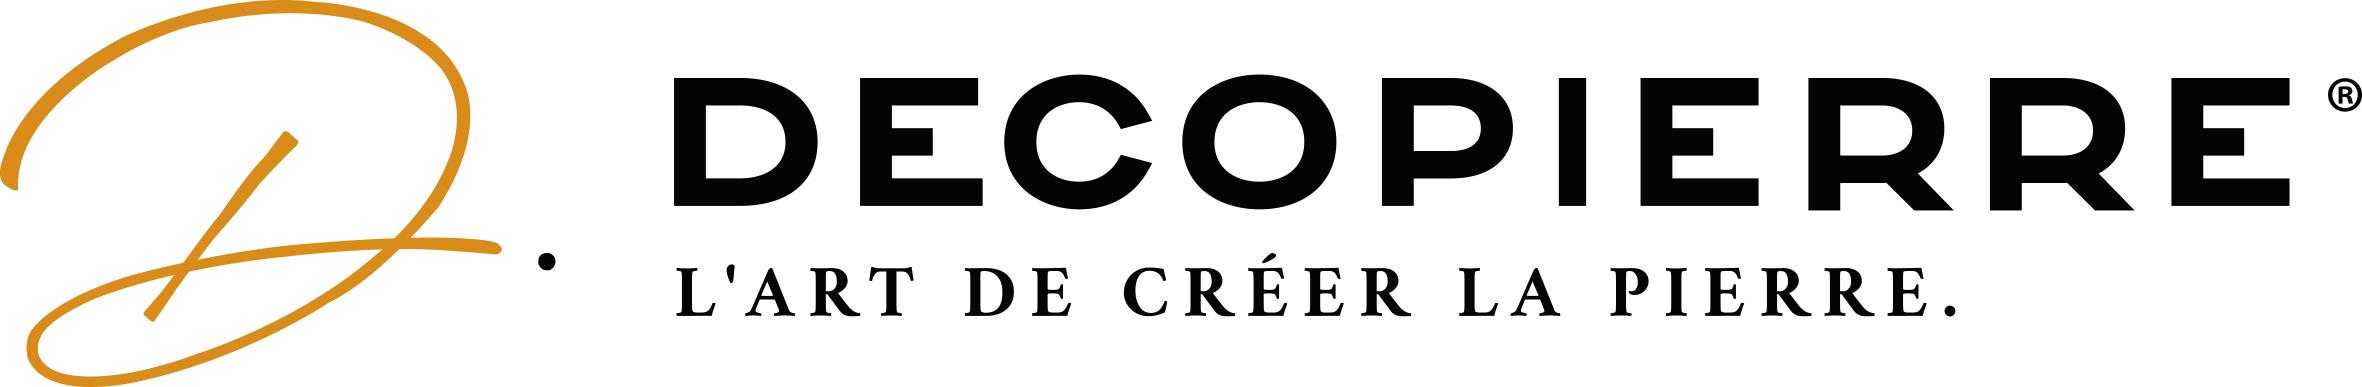 logo DECOPIERRE CMJN 1 - Accueil